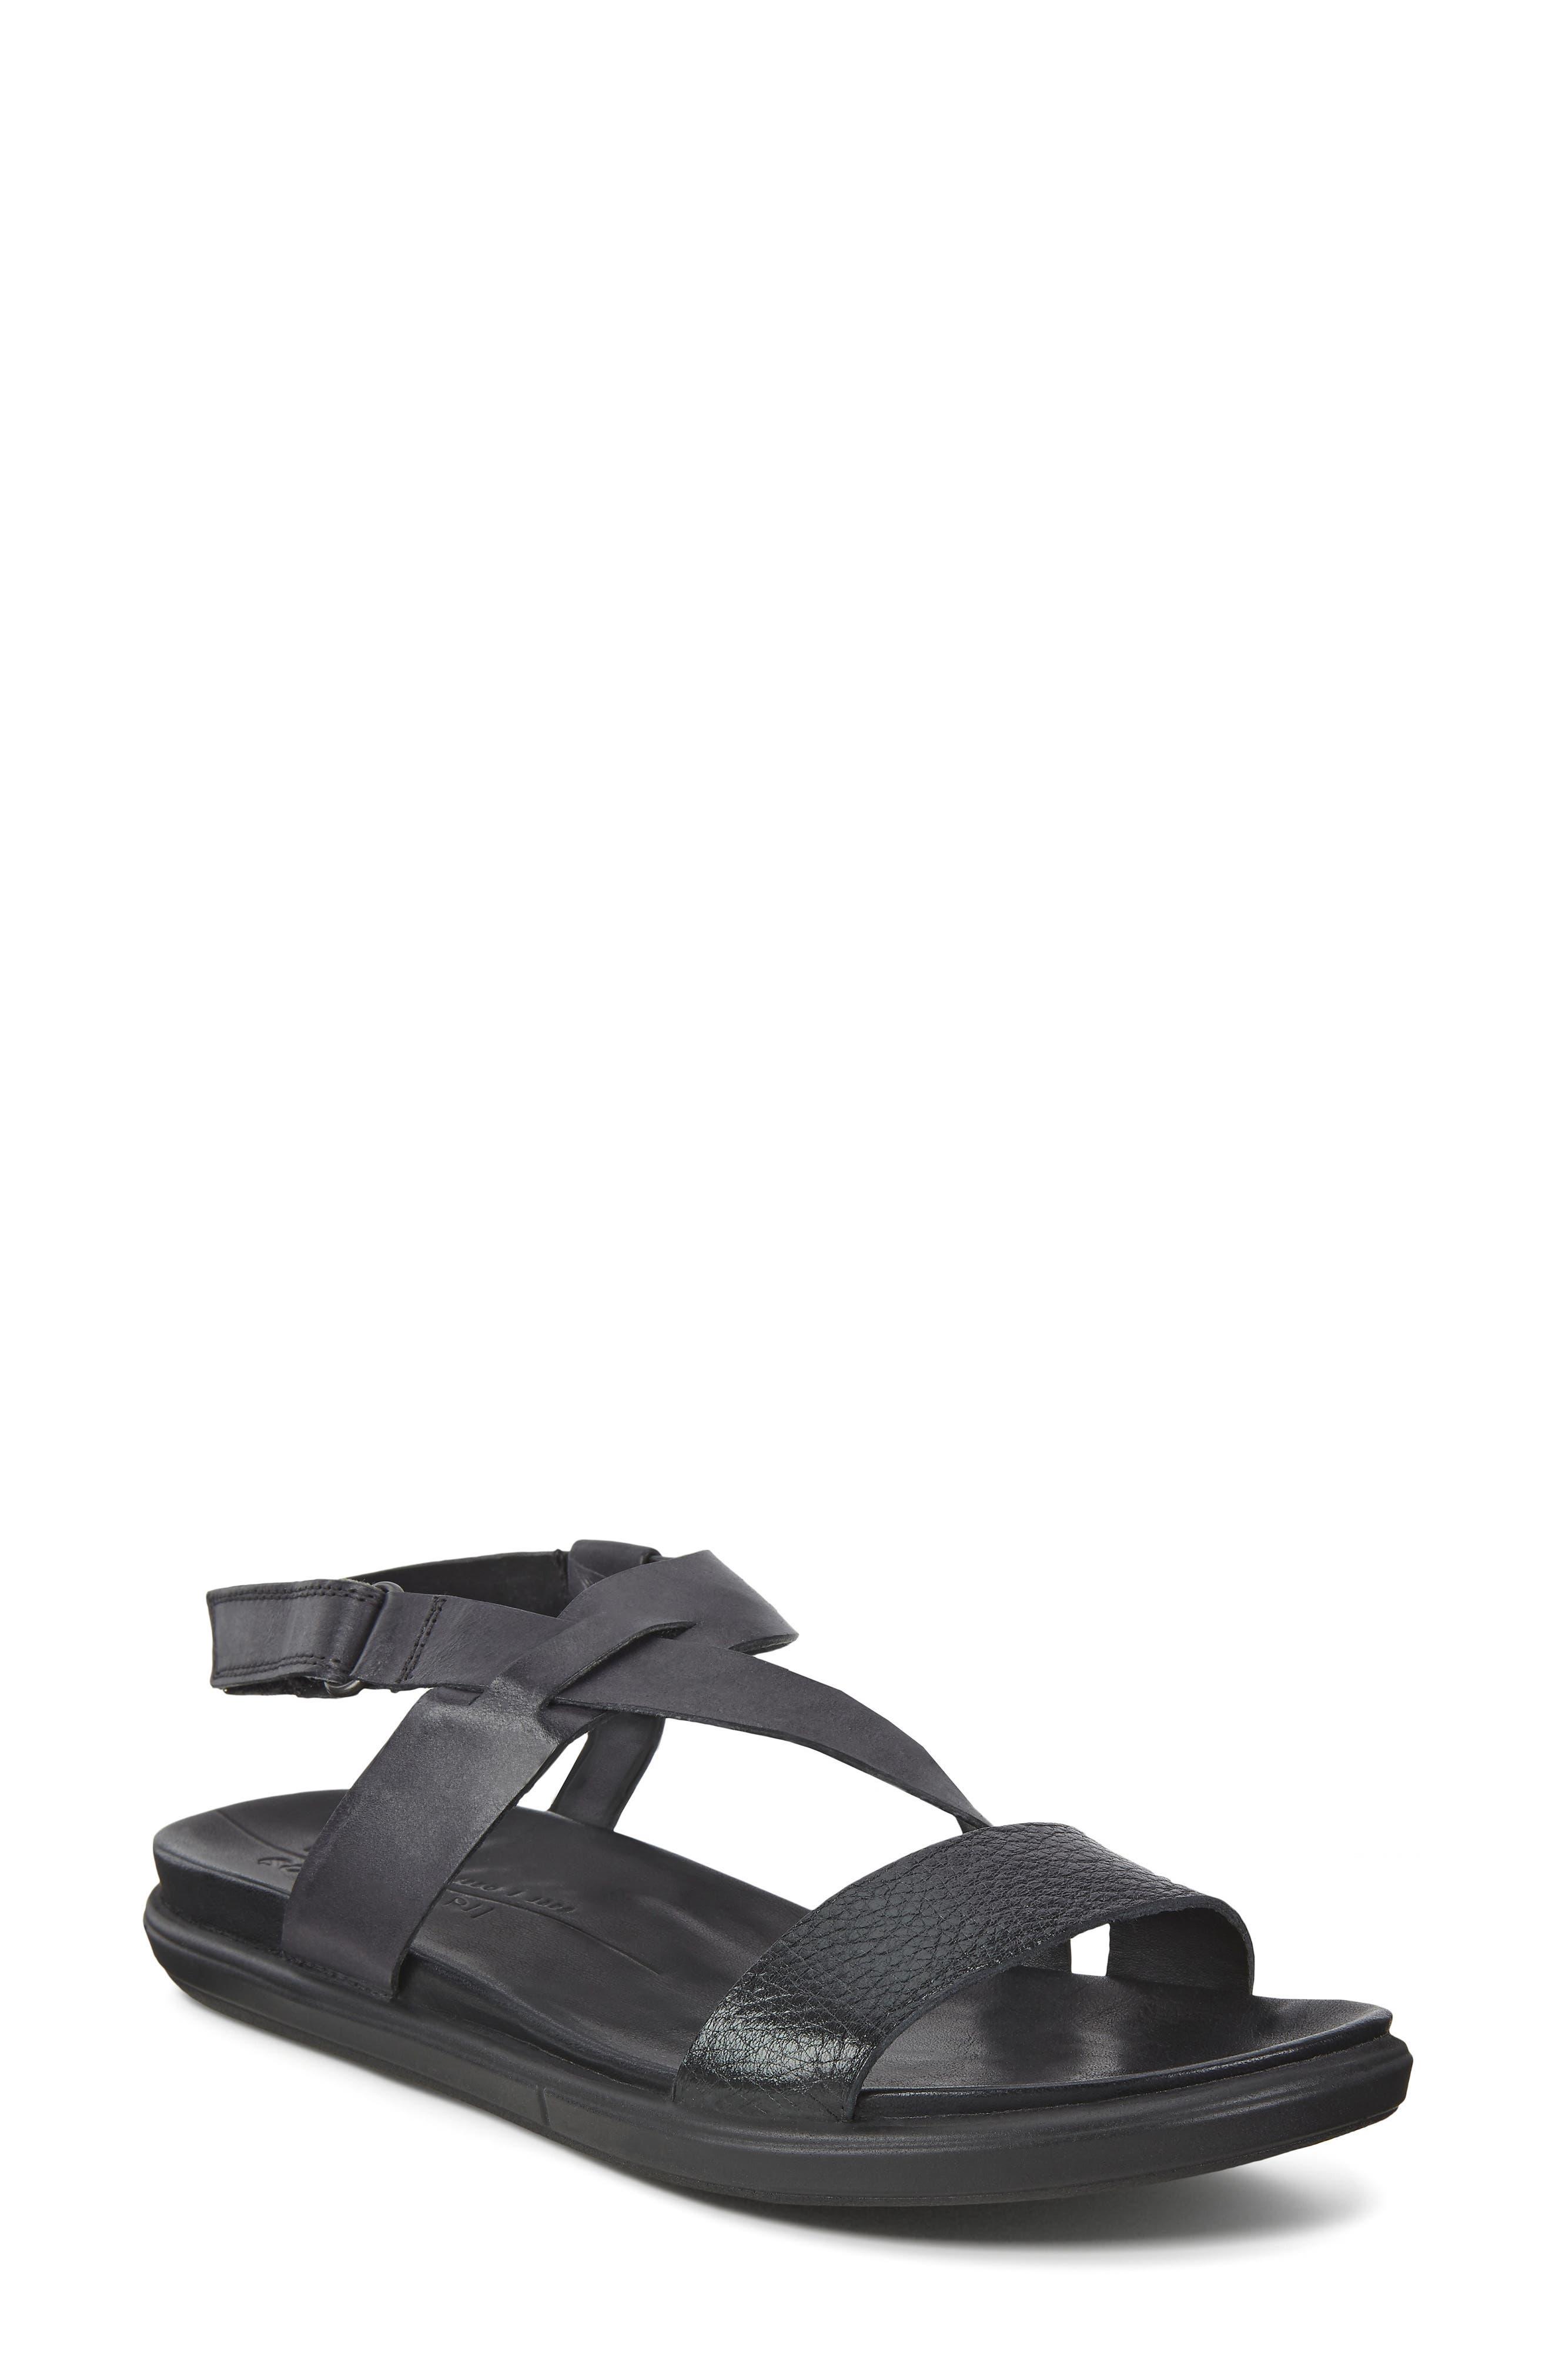 ECCO Women's Ecco Simpil Strappy Sandal, Size 5-5.5US - Black